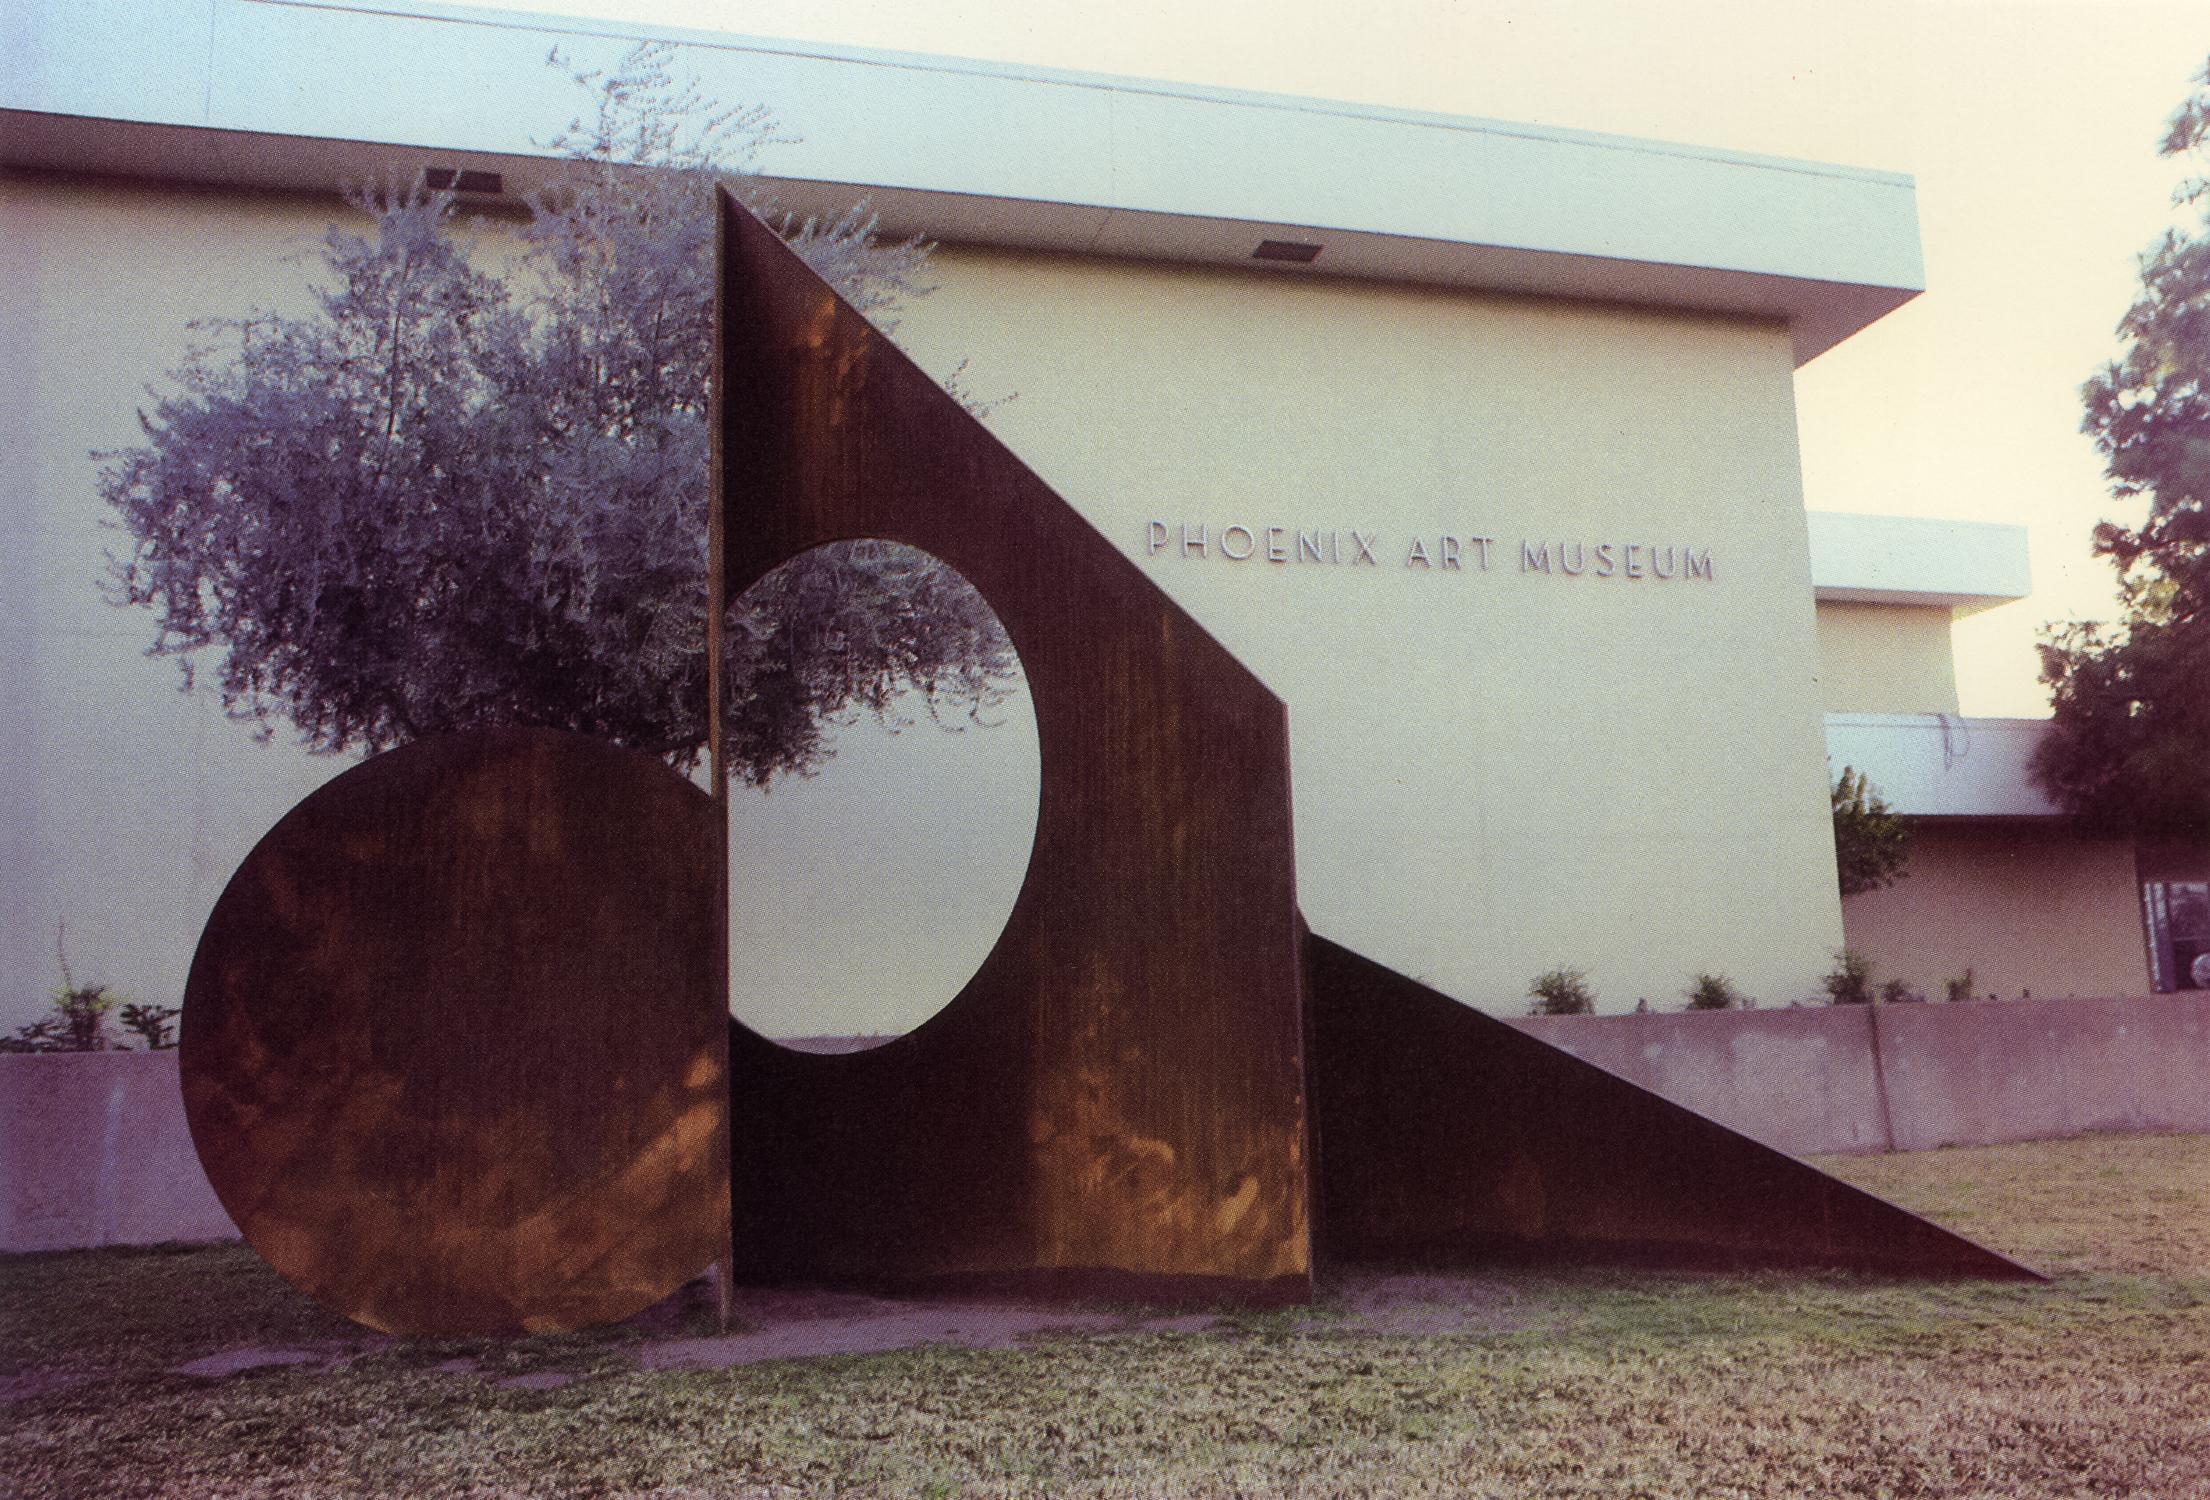 Phoenix Museum of Art, Phoenix, Arizona; 1979.  M.H. X.  14' x 16' x 14'.